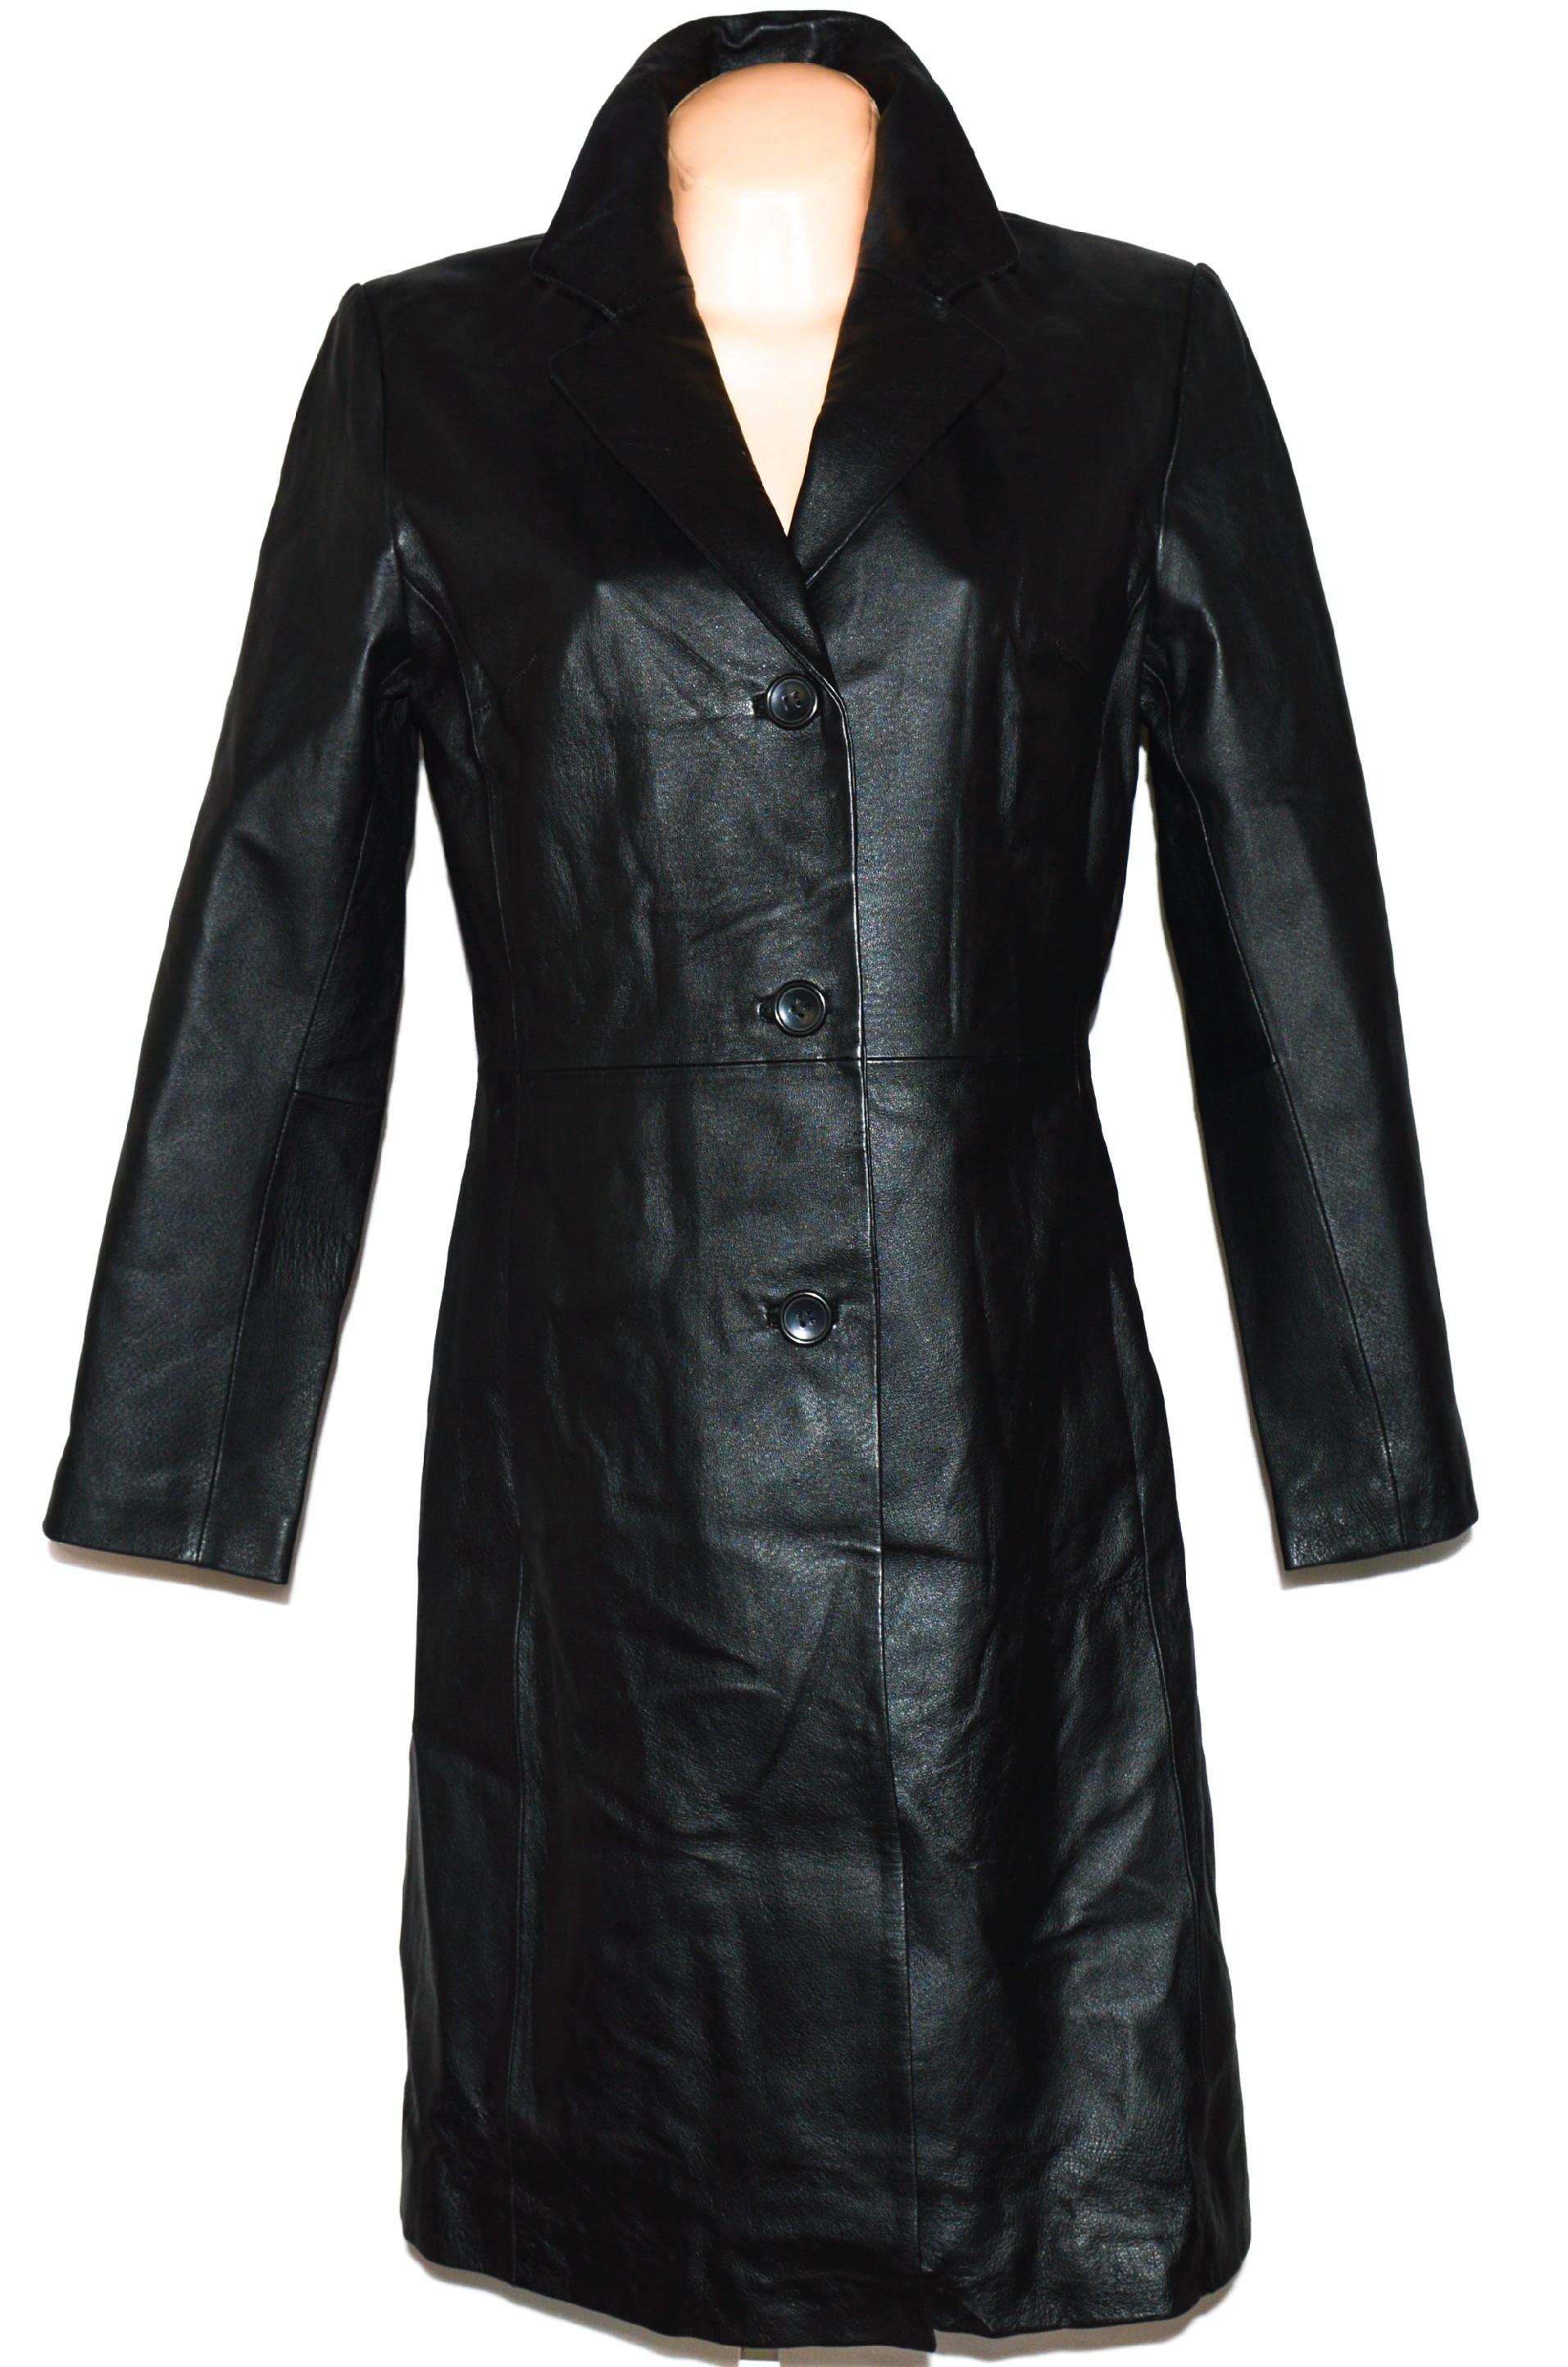 KOŽENÝ dámský dlouhý černý kabát Target L